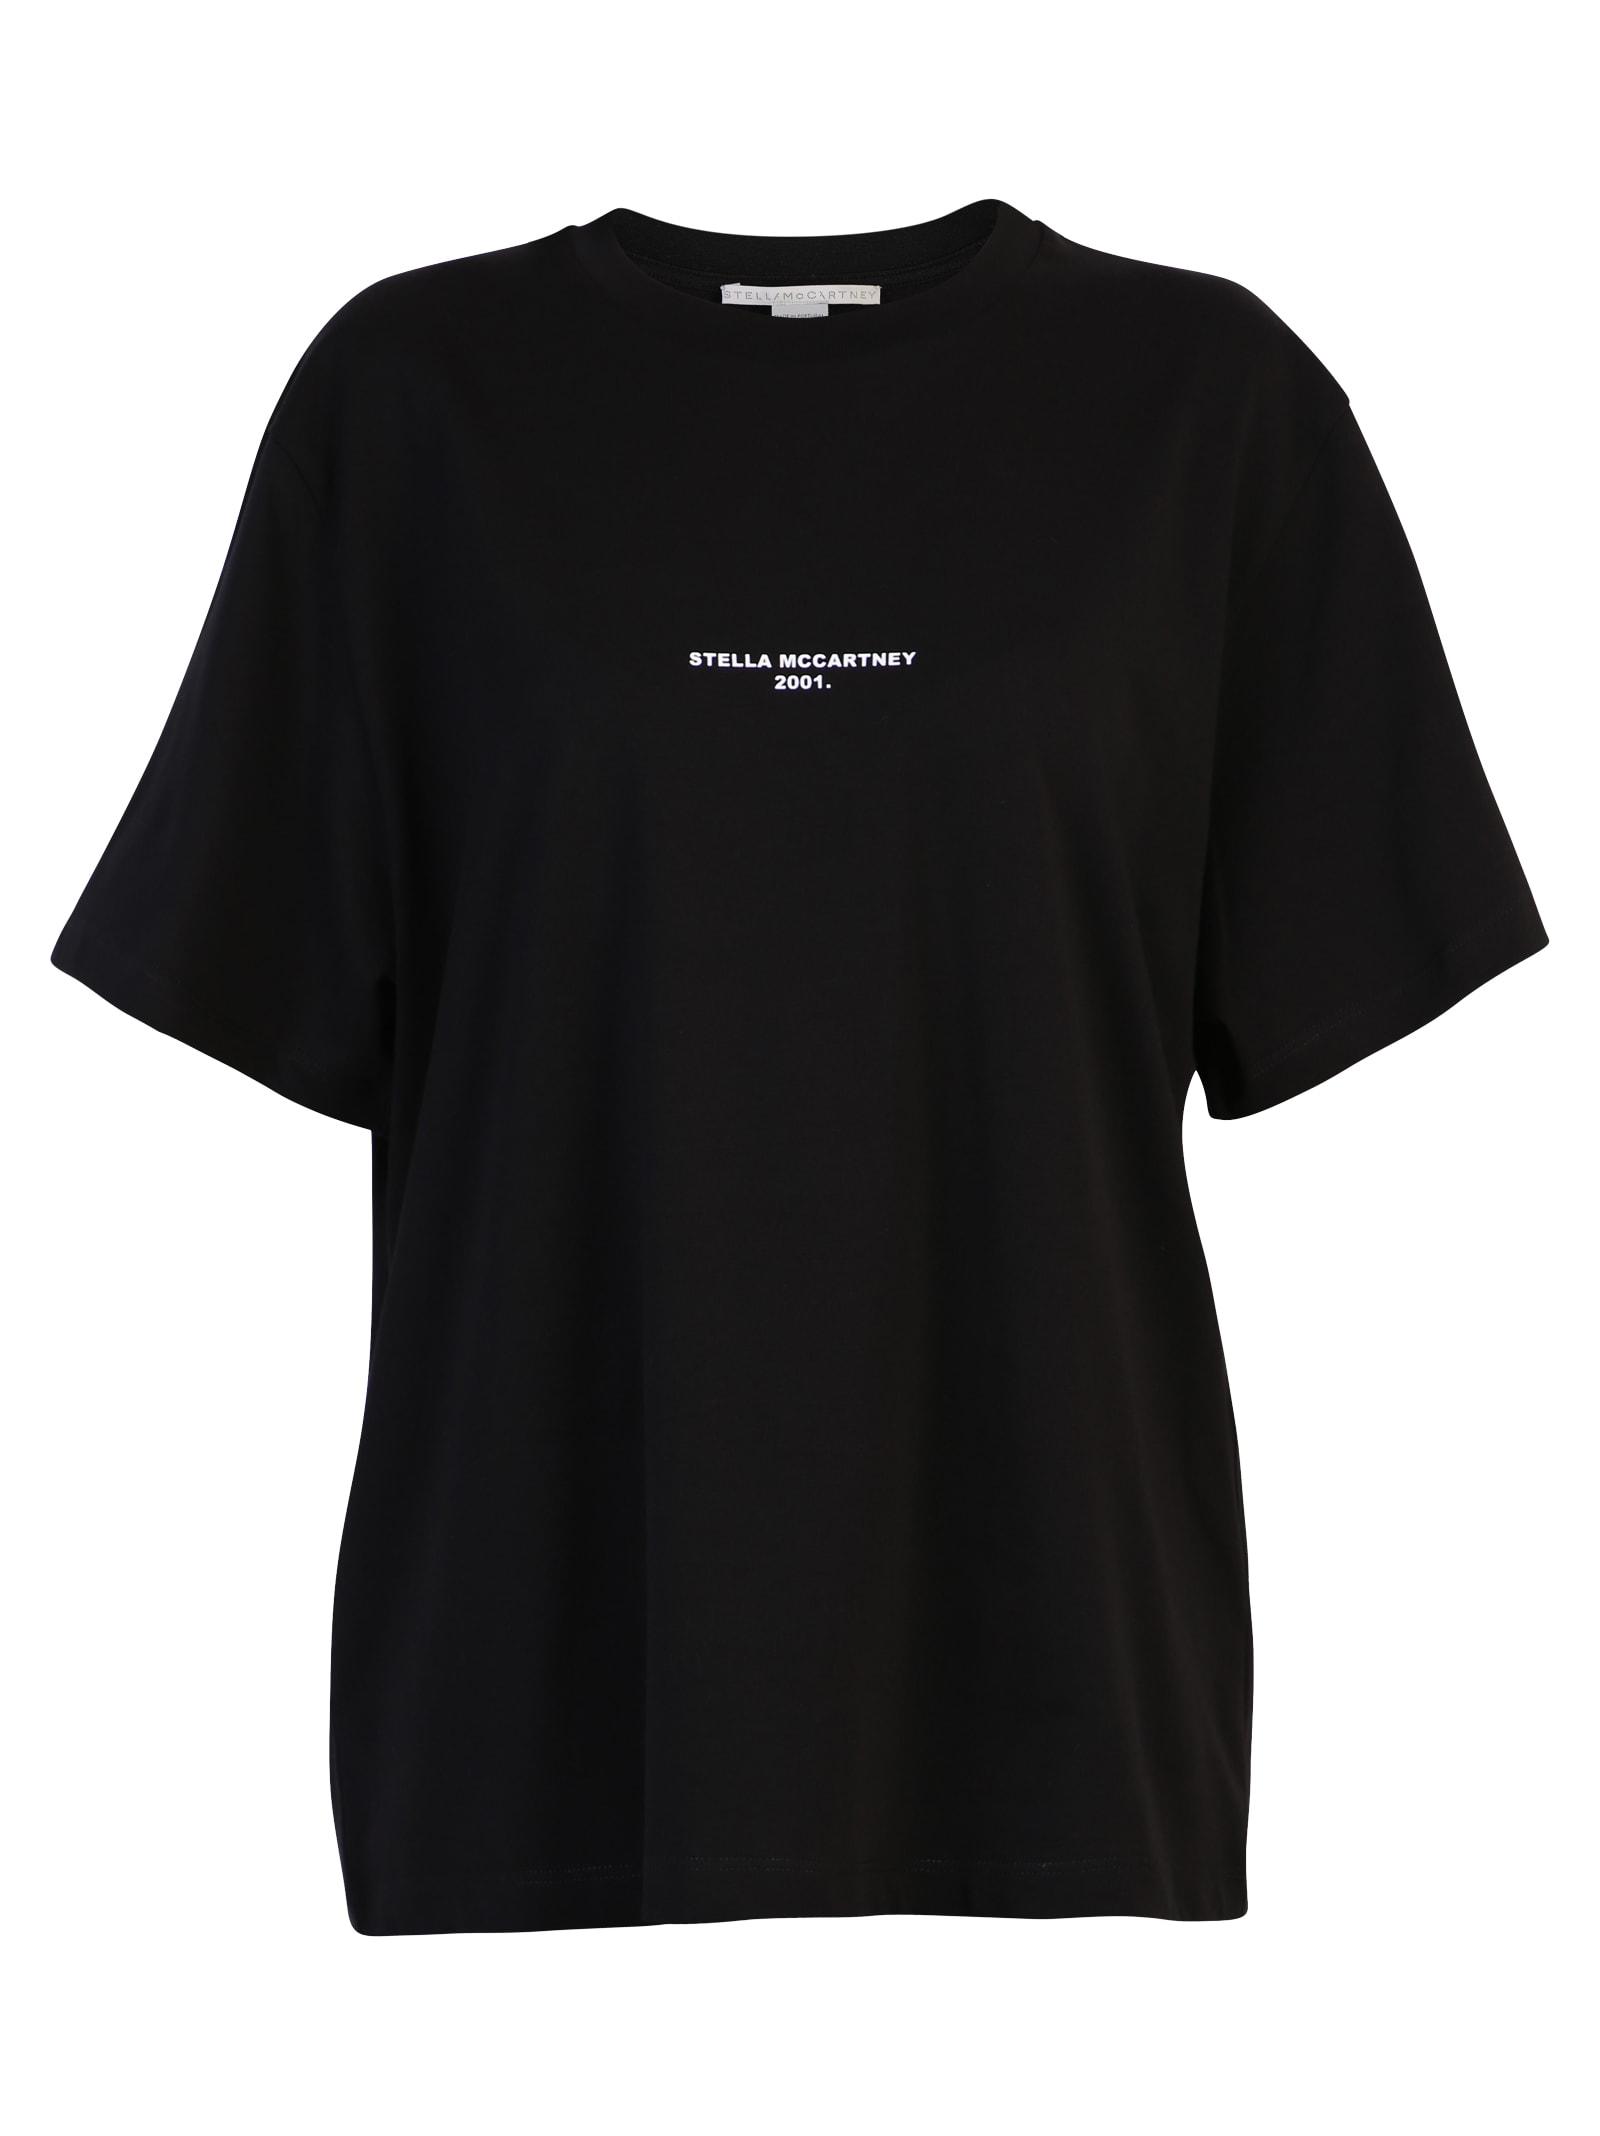 Stella McCartney Branded T-shirt